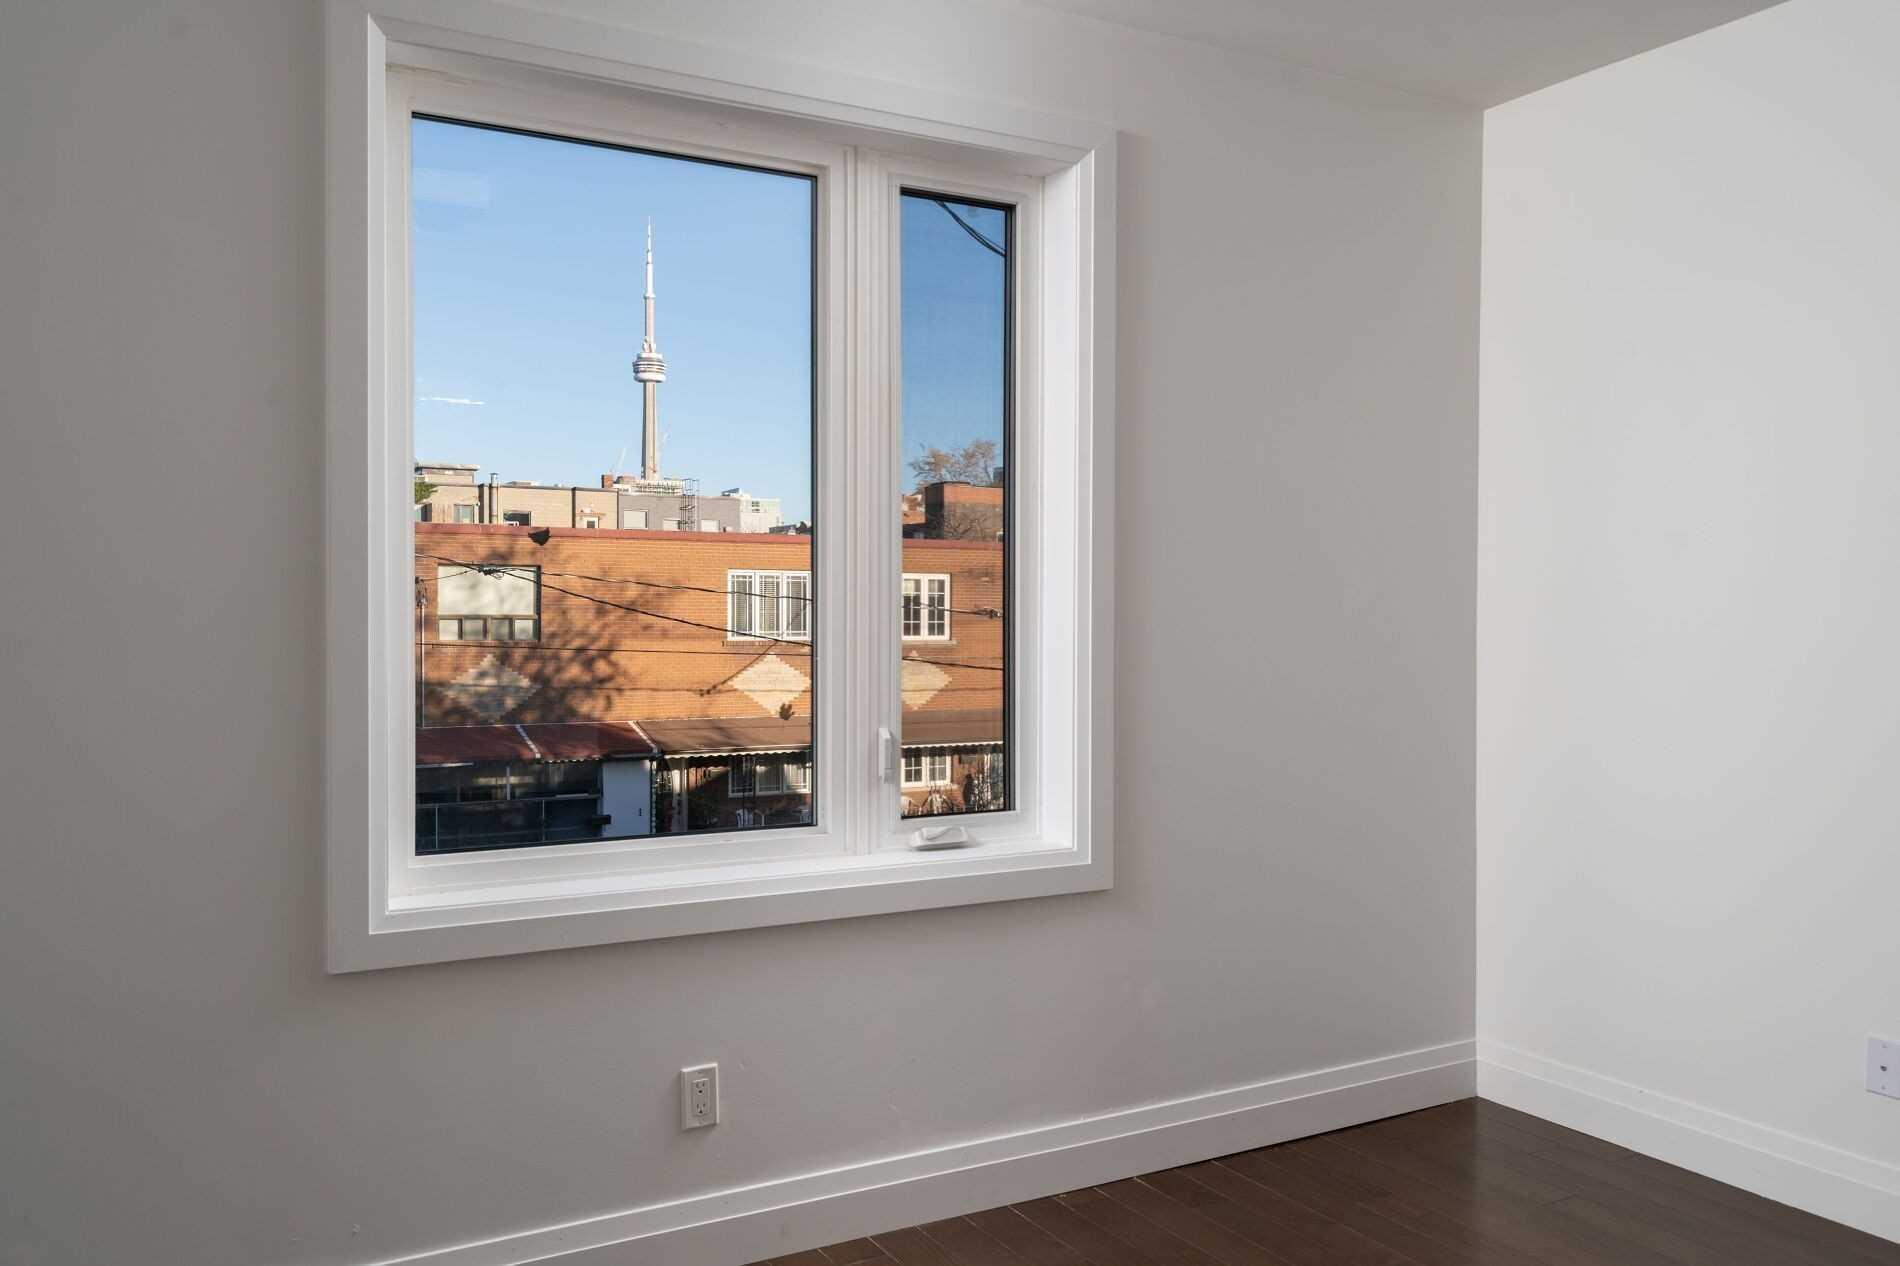 146 Strachan Ave Property - Steve Jelenic Toronto